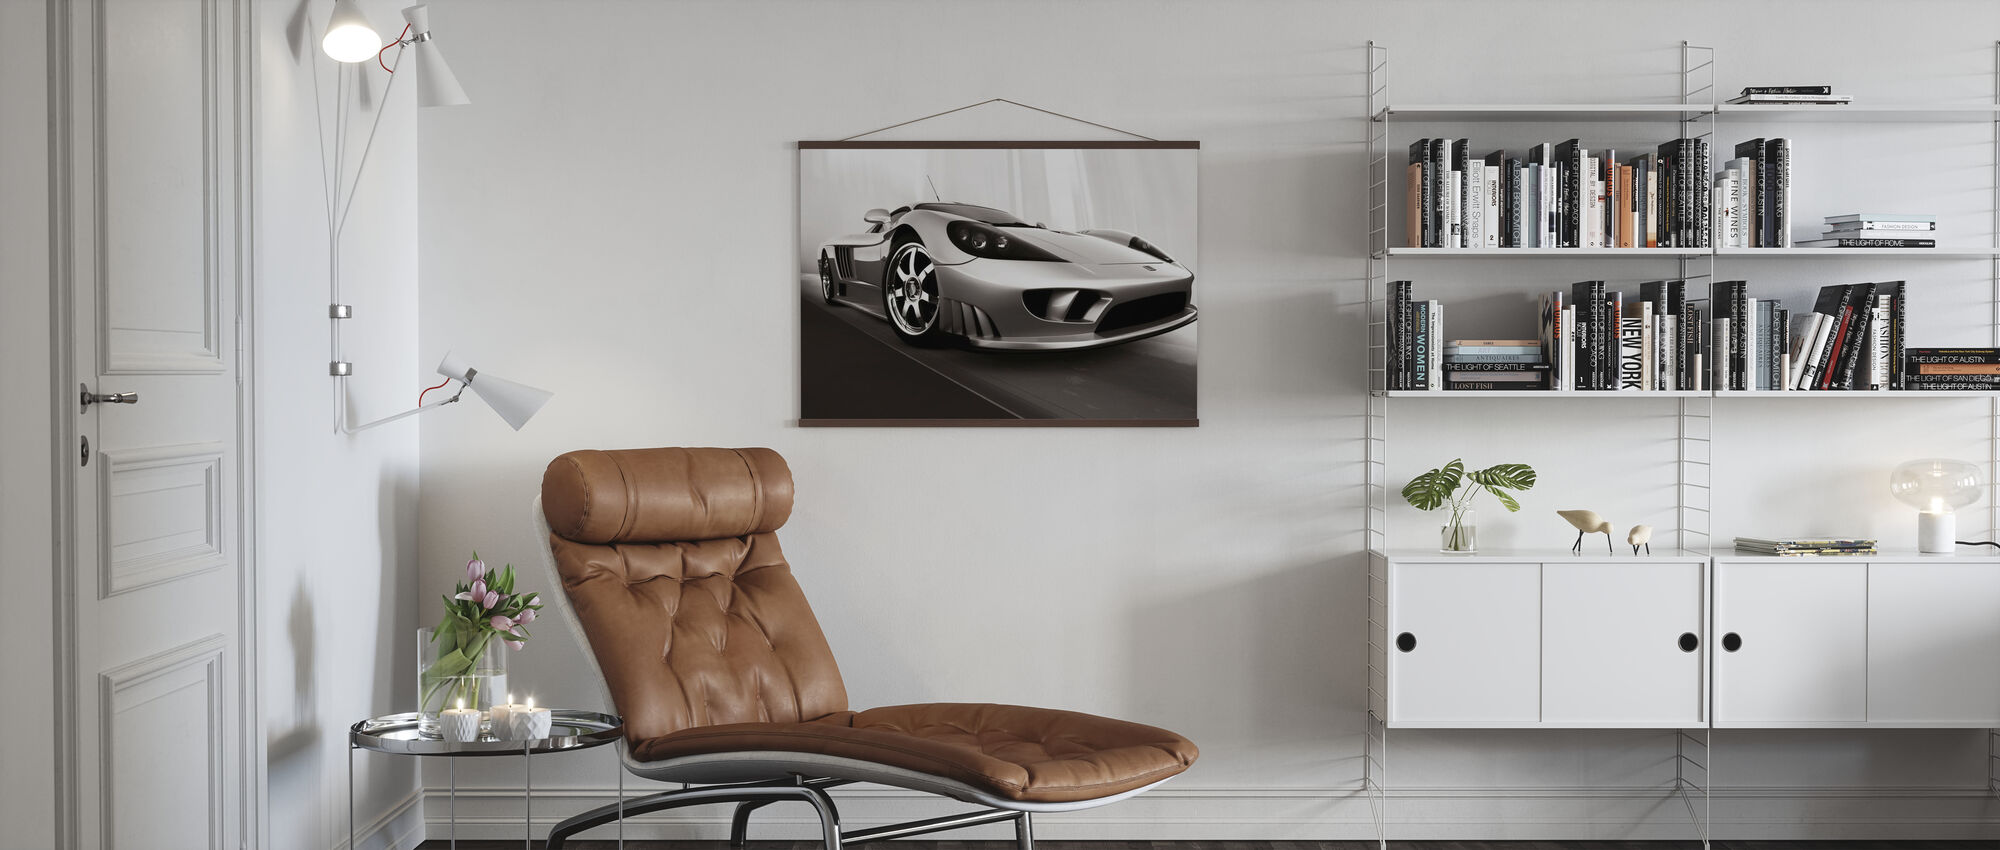 Saleen S7 - b/w - Poster - Living Room